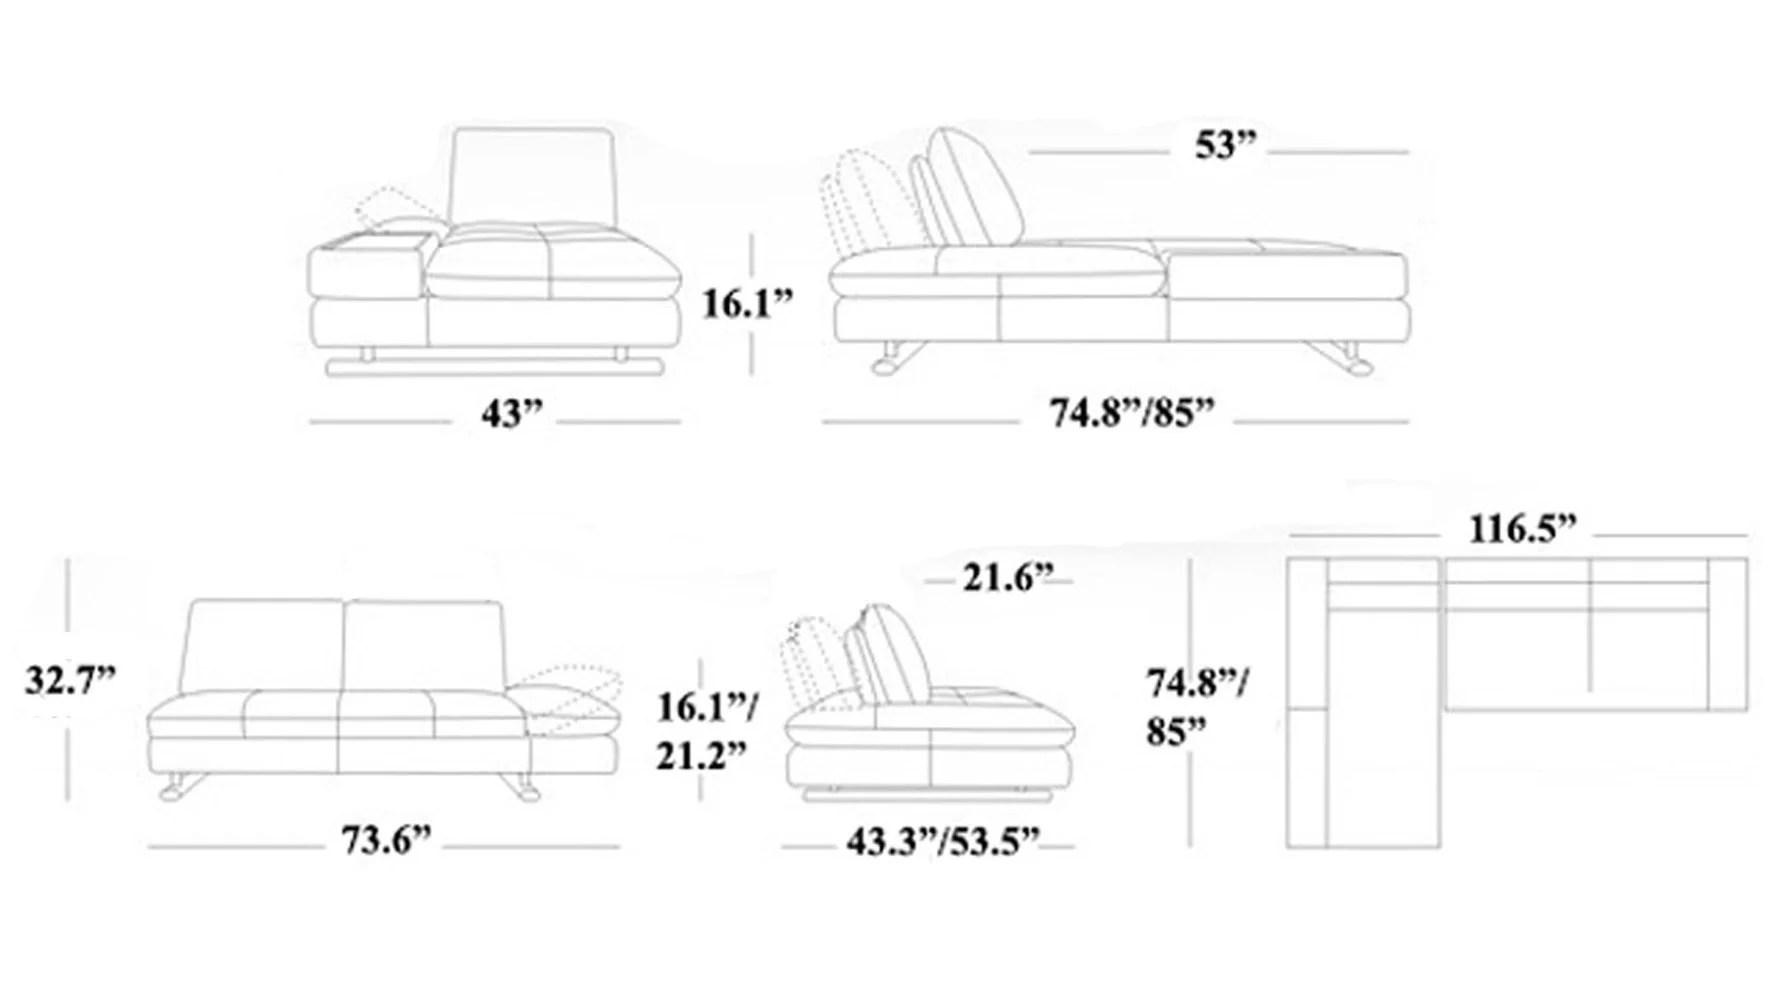 chez long sofa bed supports average length – thesofa